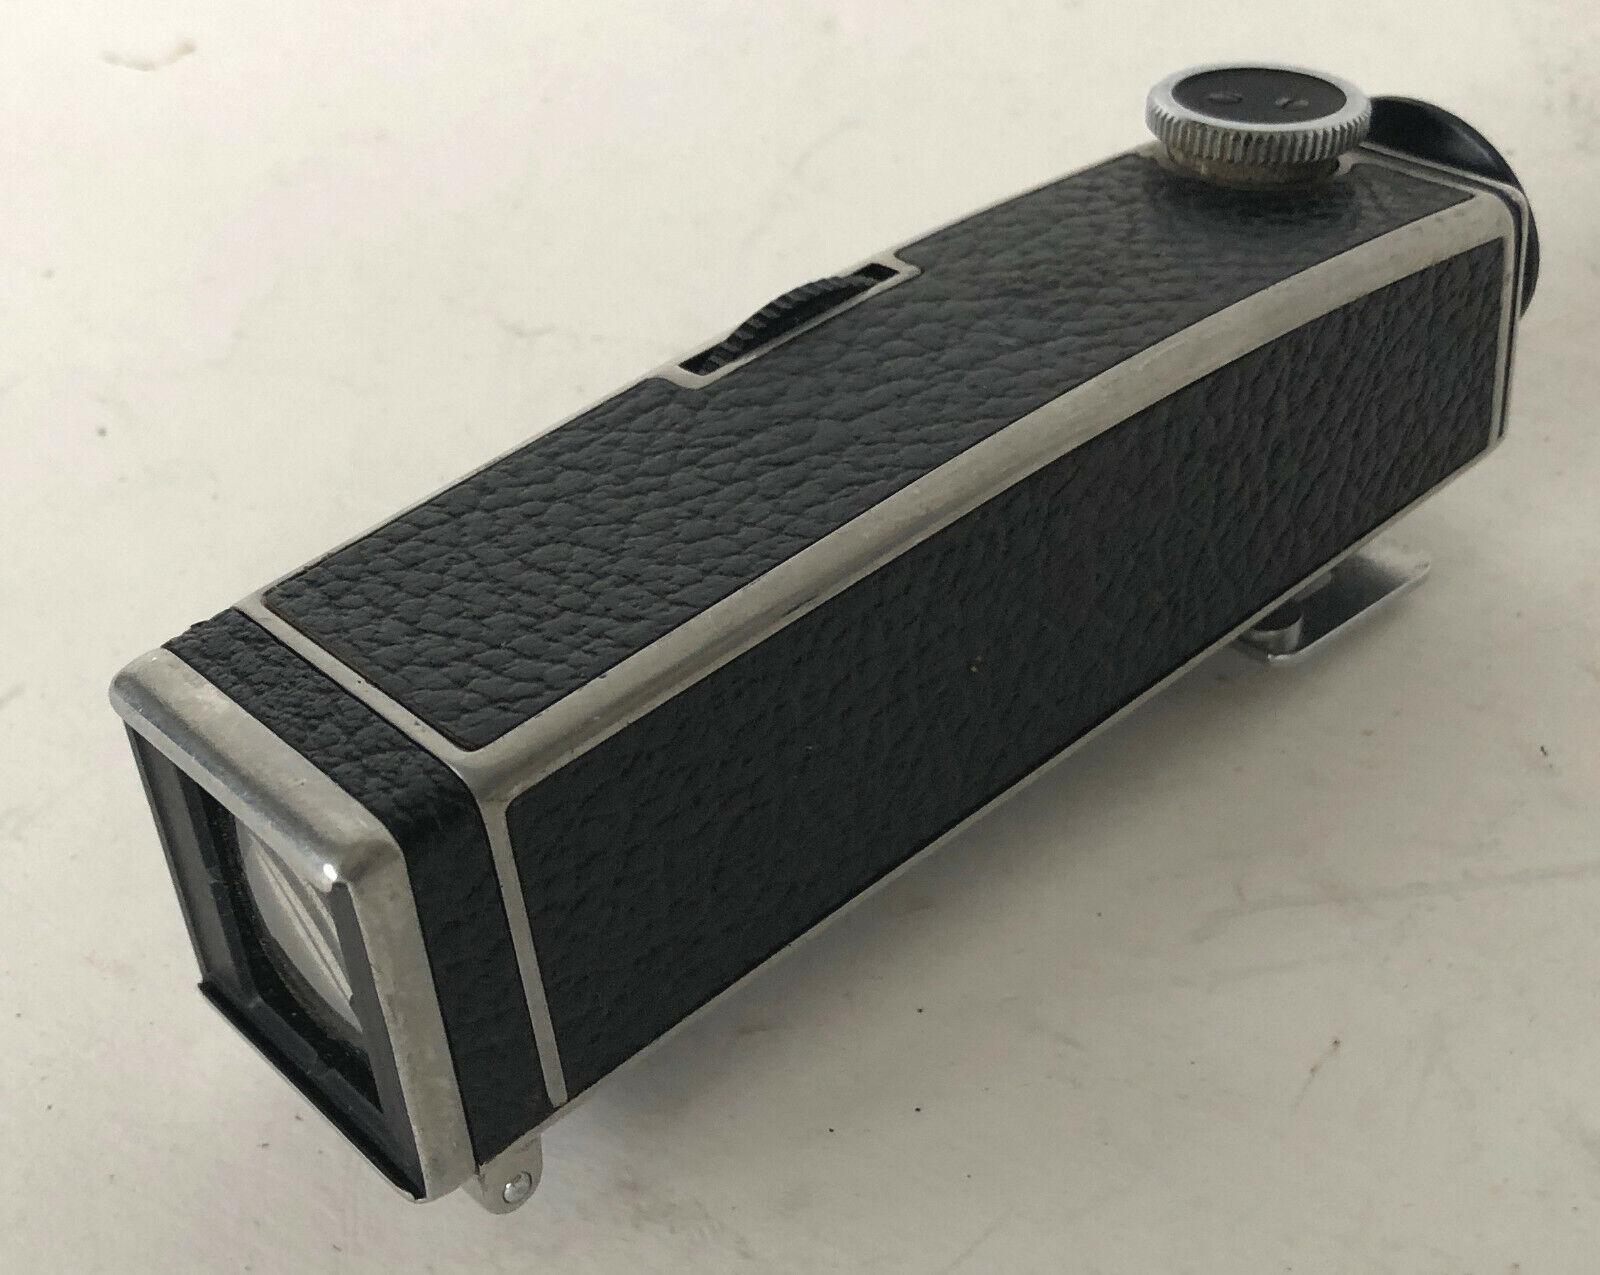 Bolex Paillard , Filmkamera H16, viewfinder